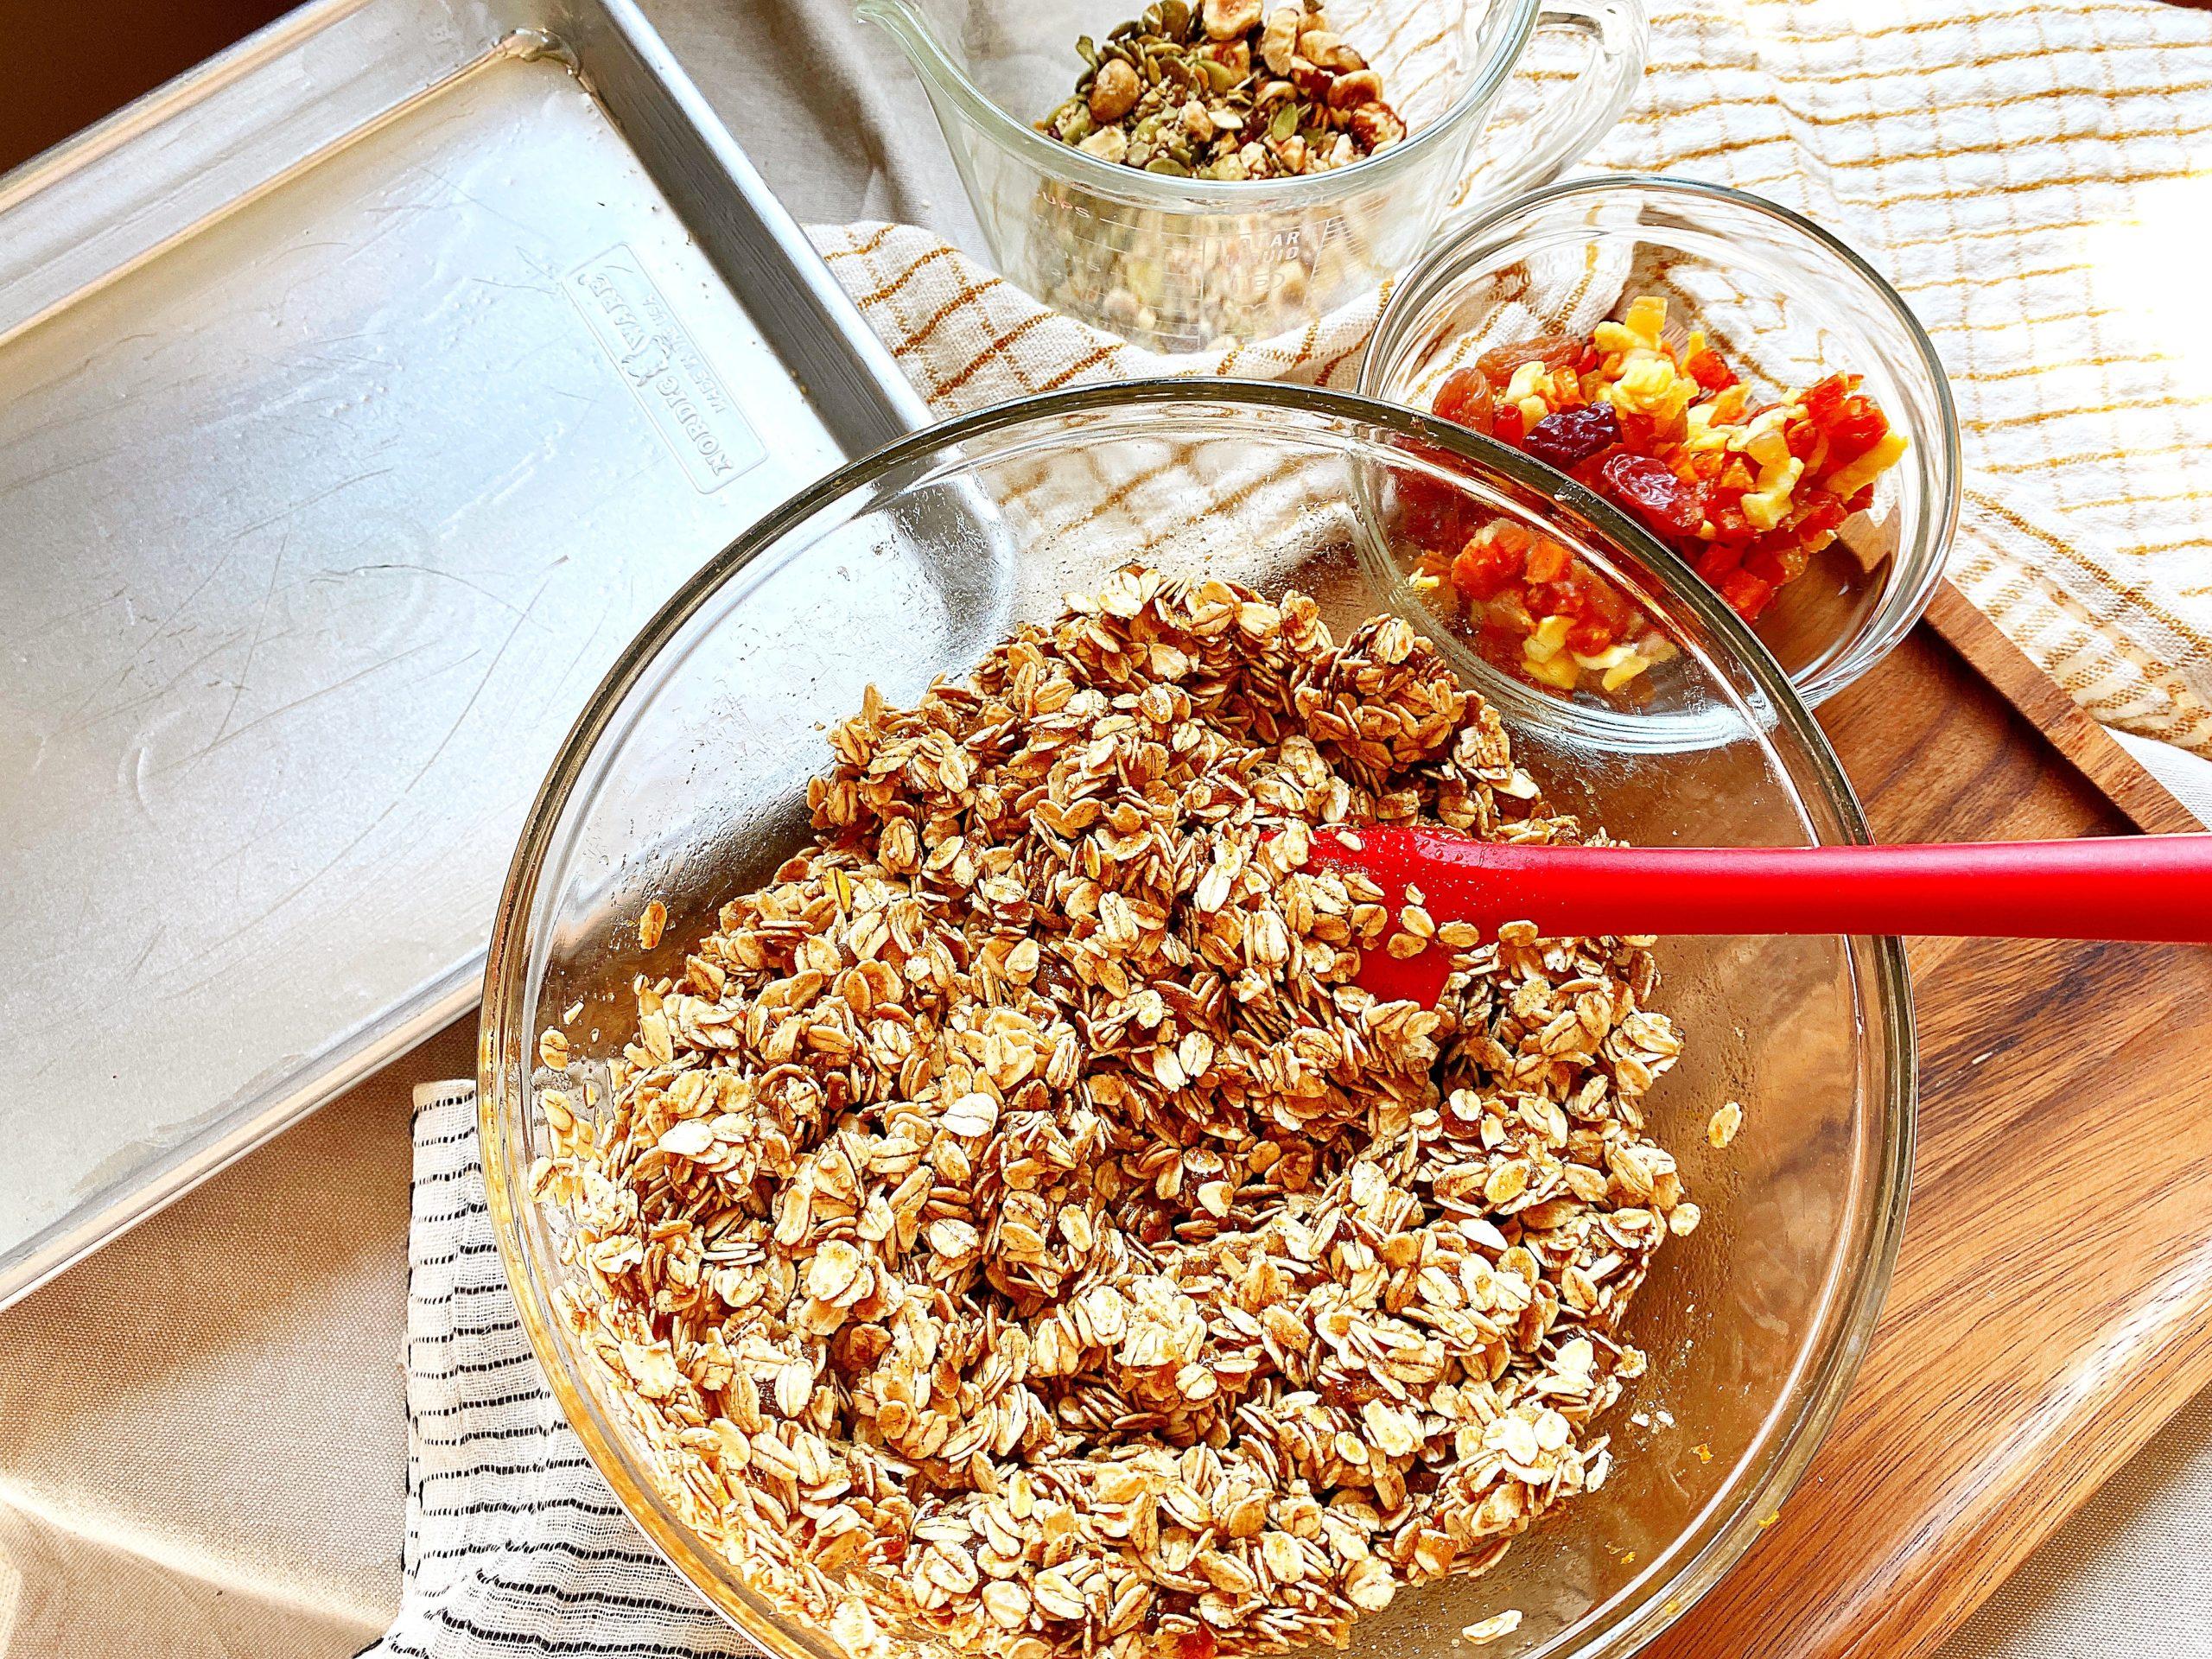 granola mixing bowl